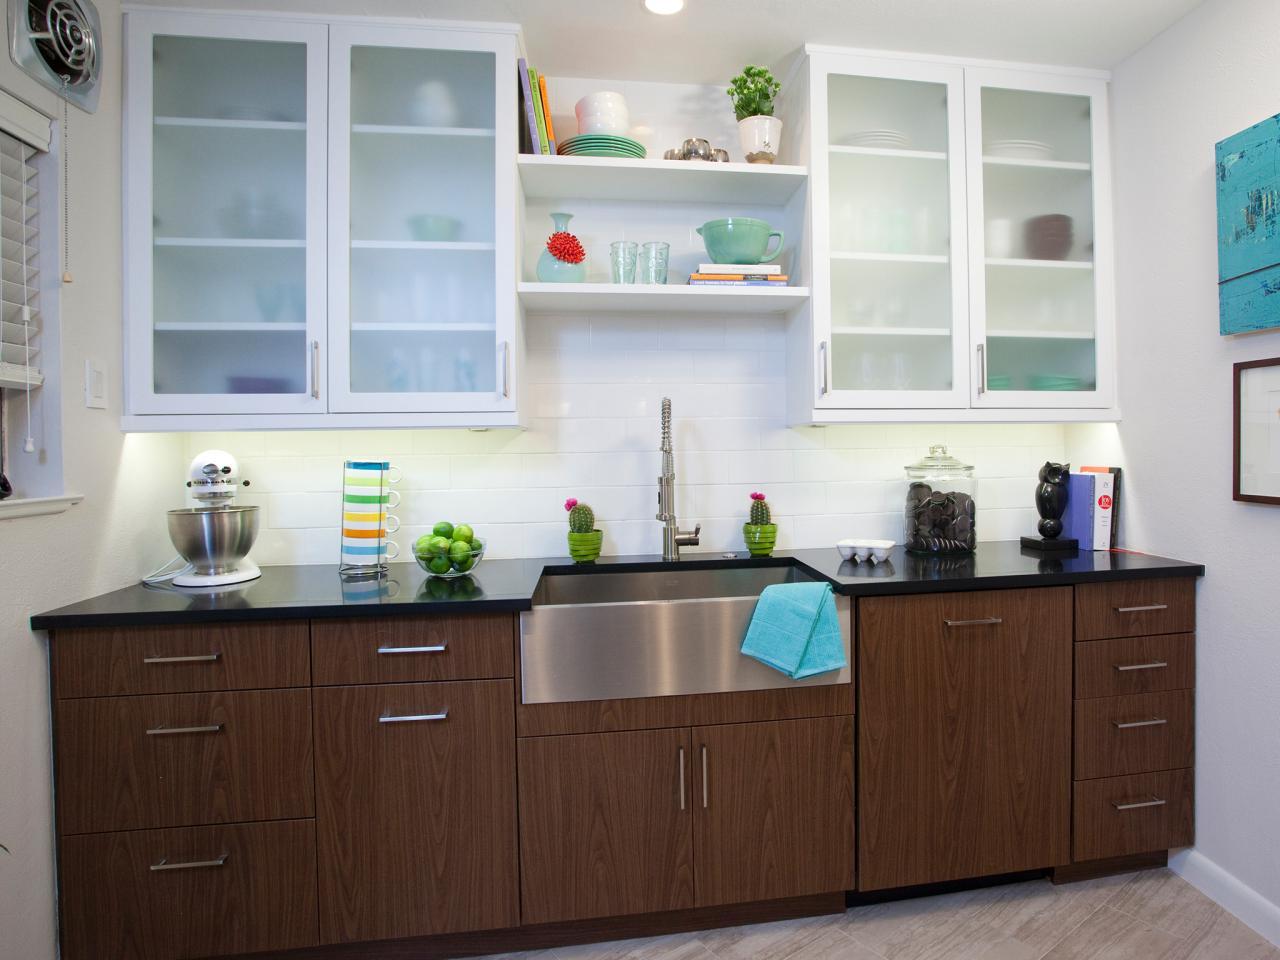 HPBRS409H_modern-white-kitchen-glass-cabinets_4x3.jpg.rend.hgtvcom.1280.960